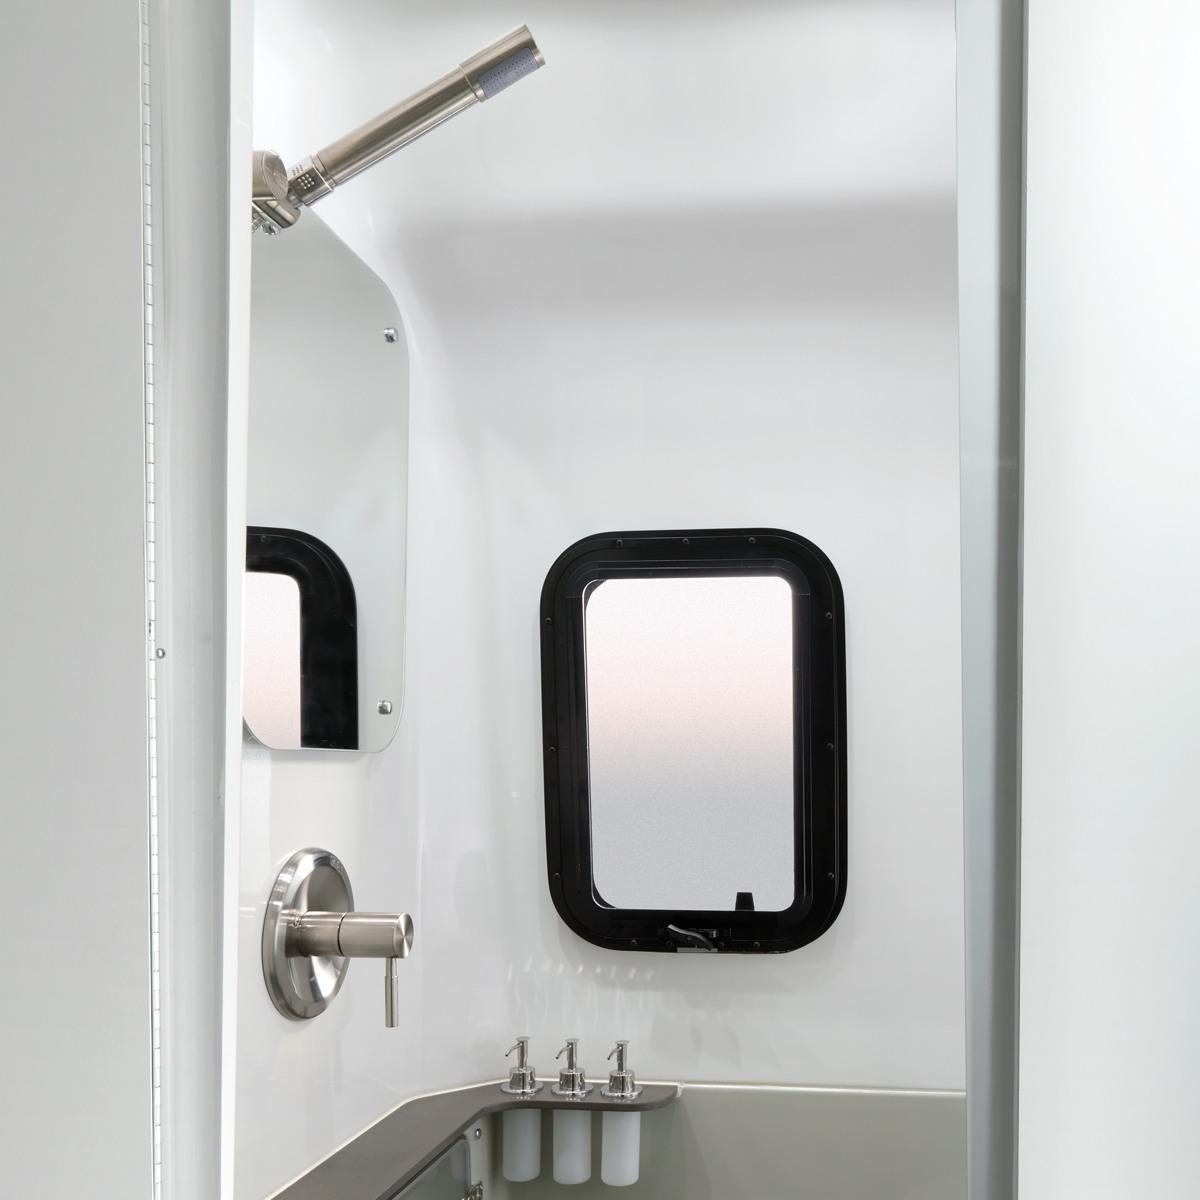 Airstream Travel Trailer rest room